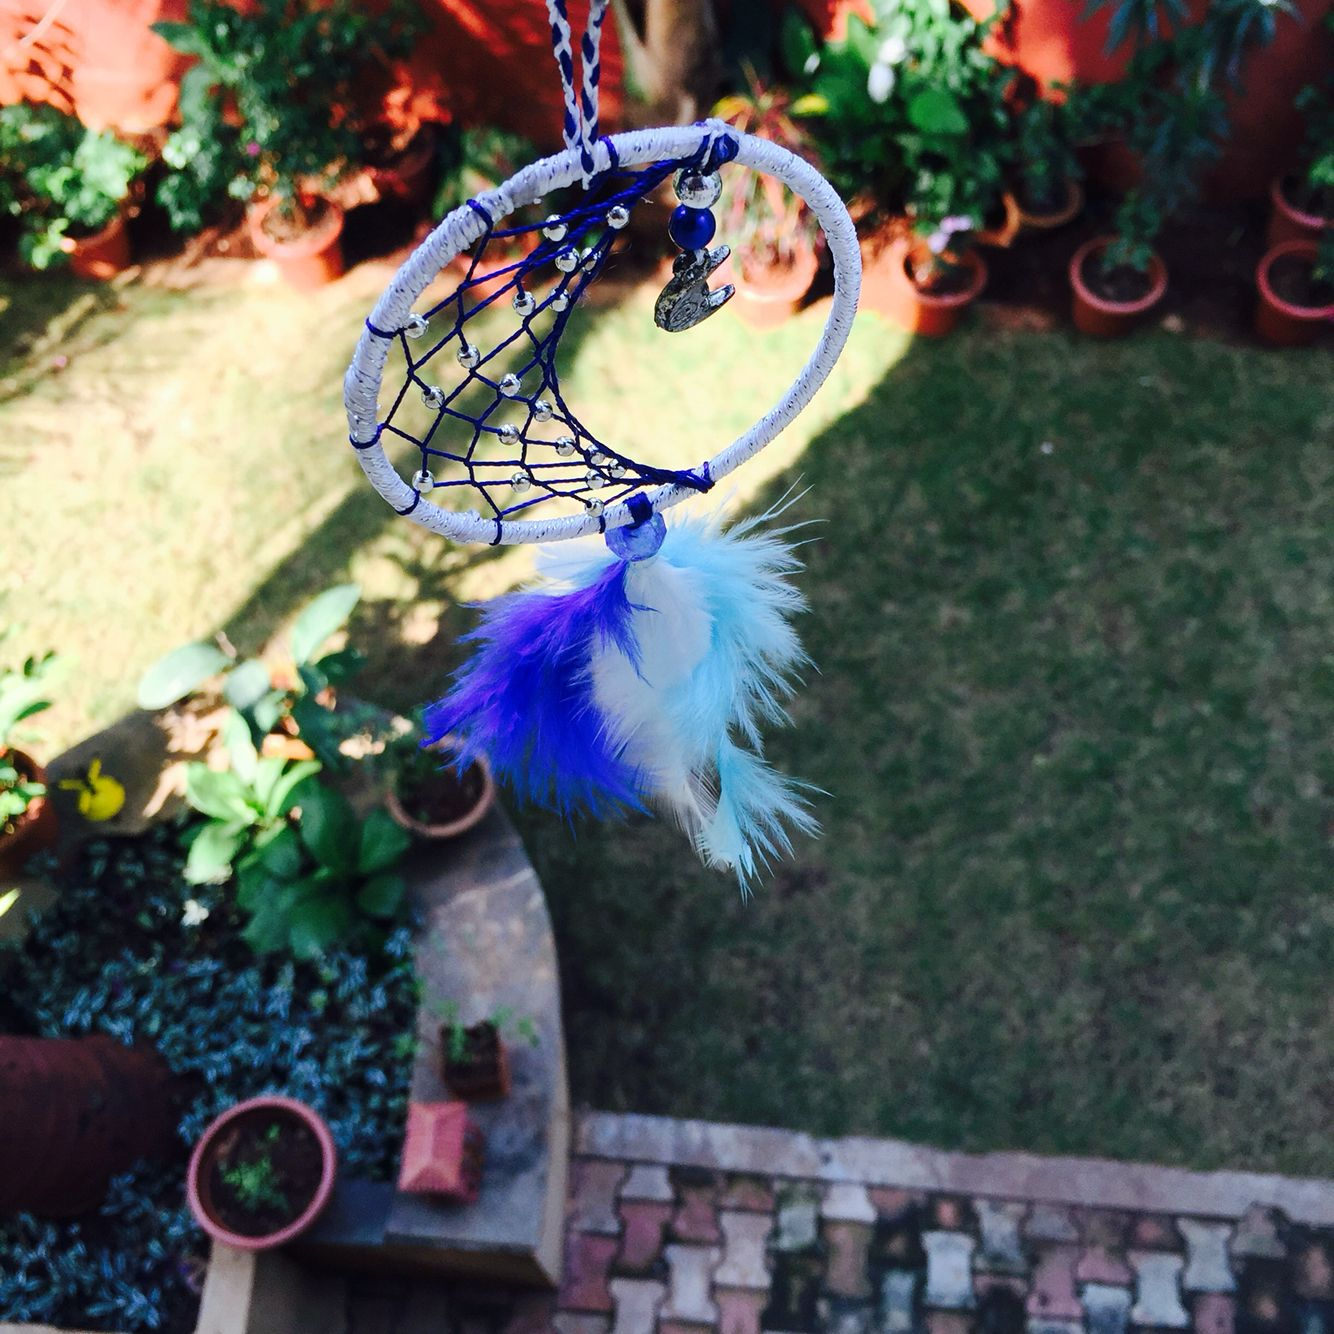 #dreams #dreamcatchers #trinkets #handmade #loveforhandmade #blue #goodvibes #postivity